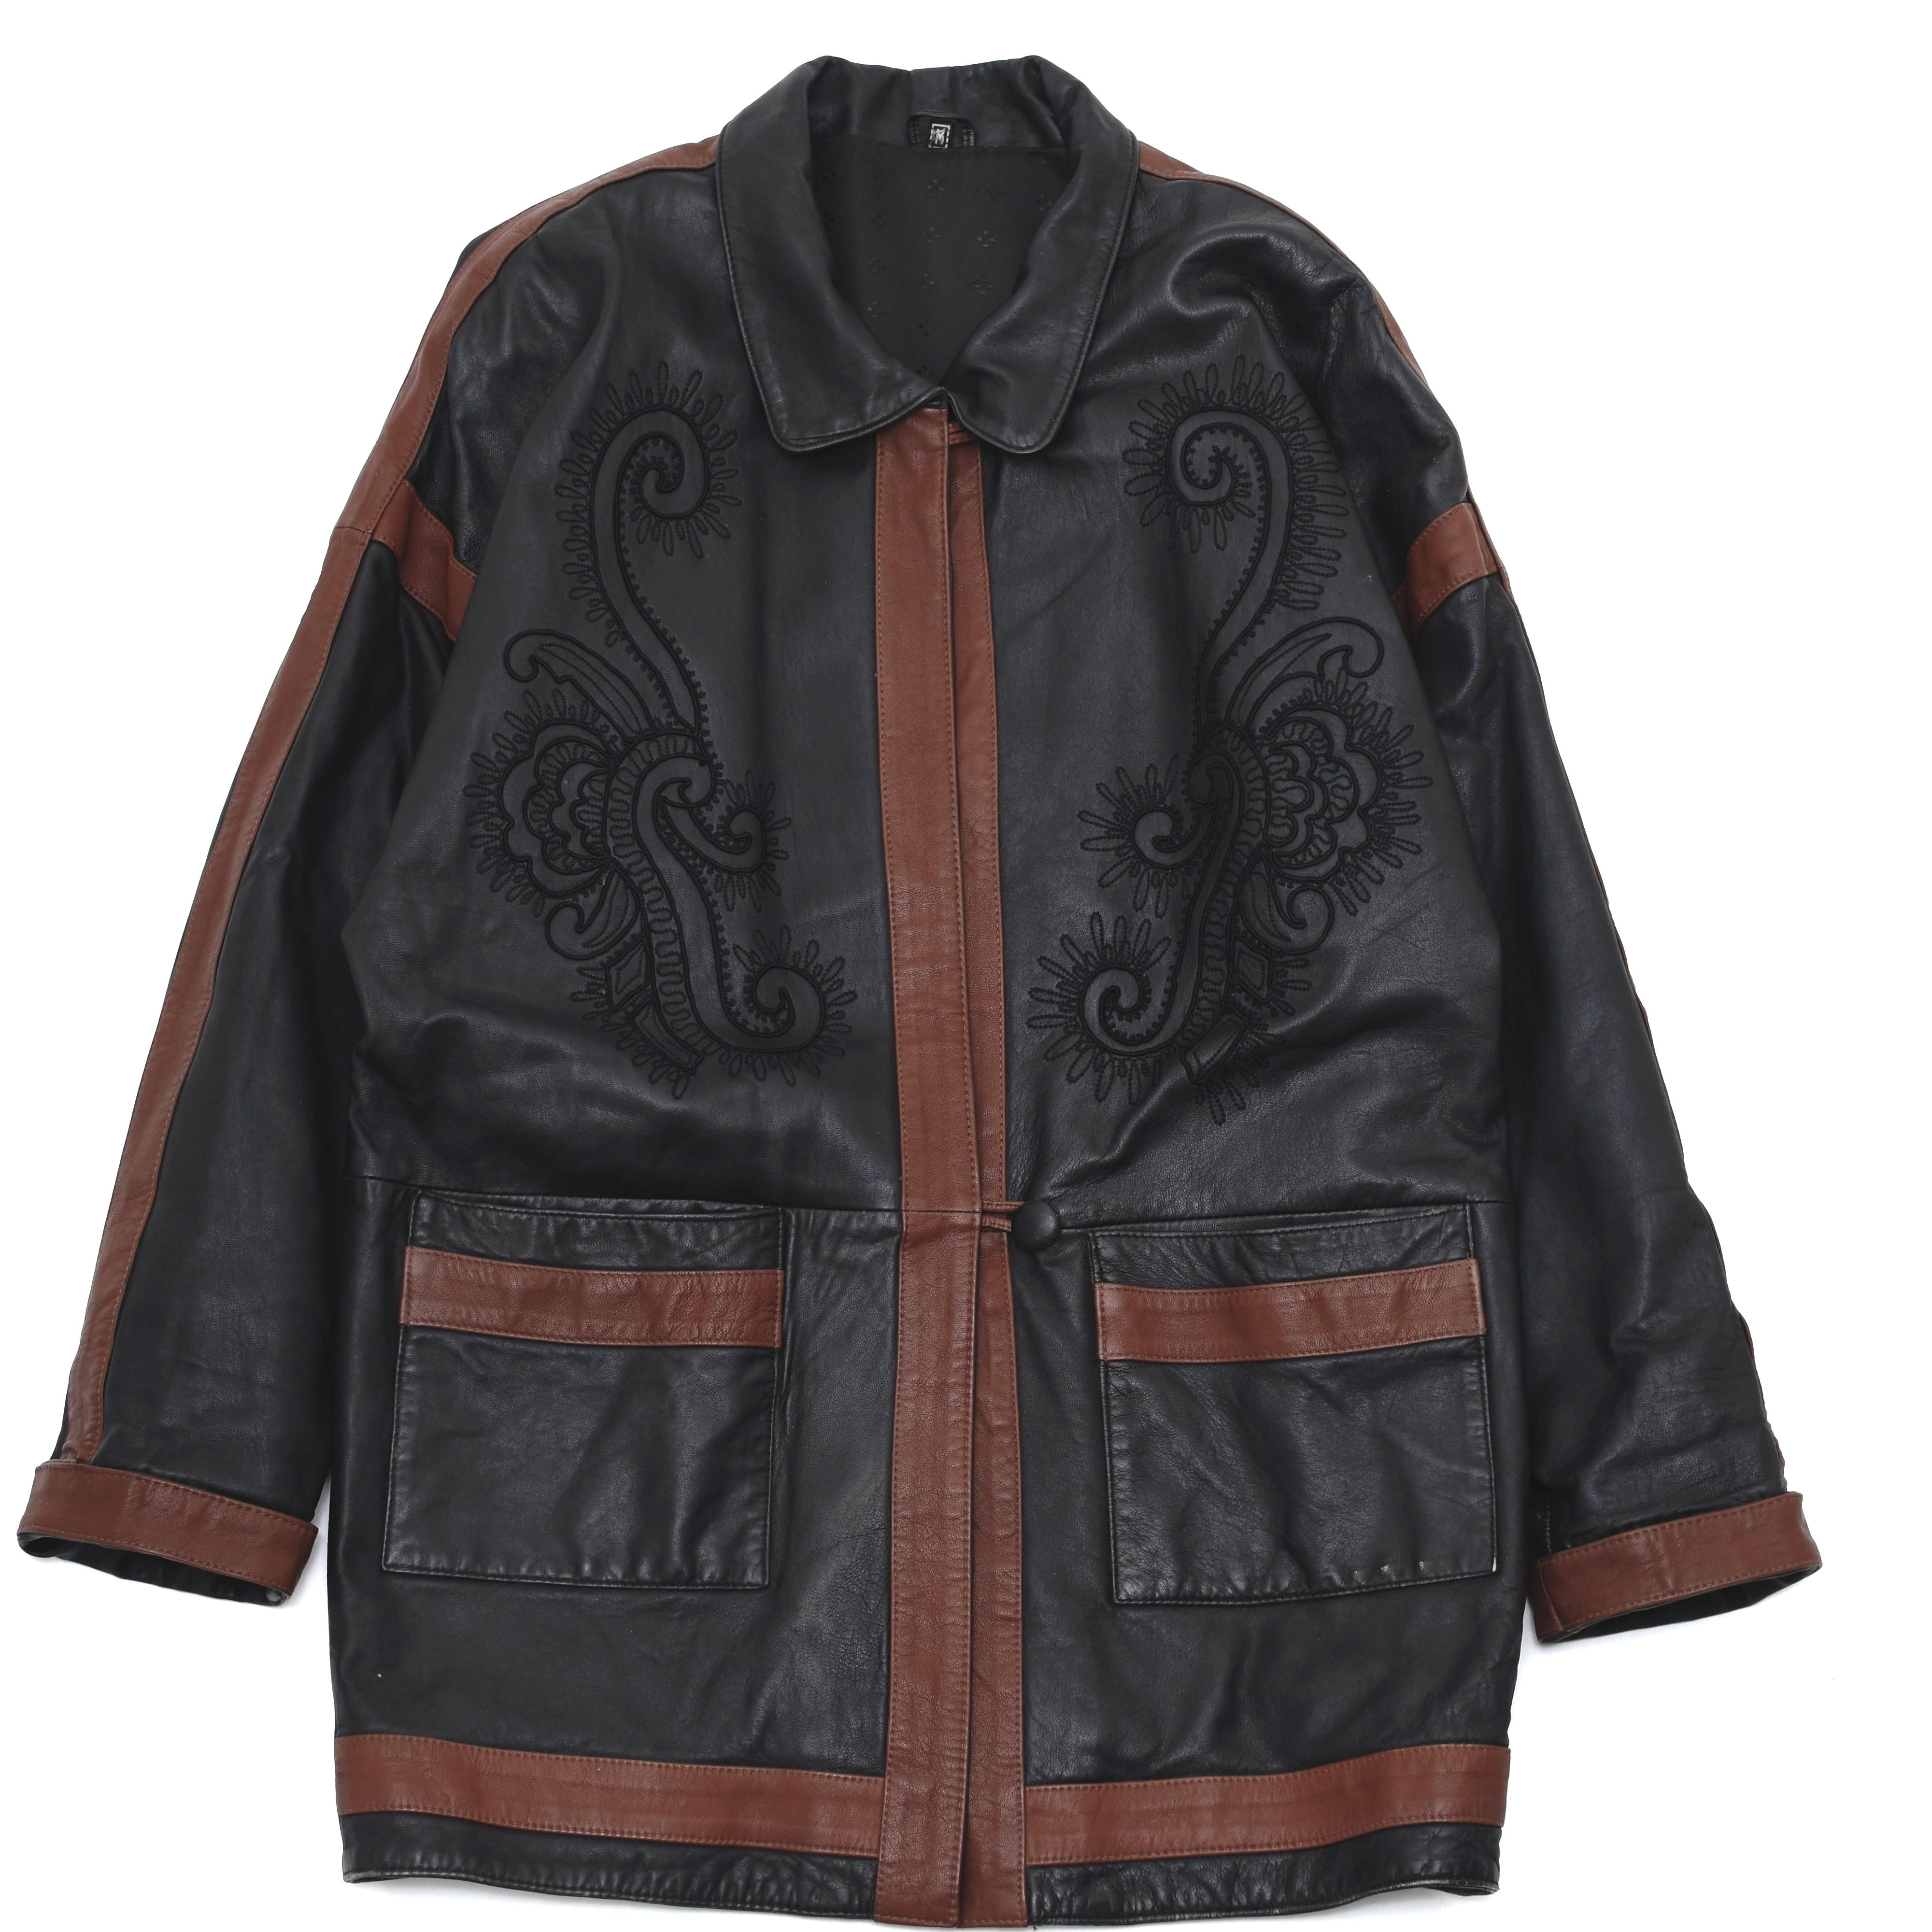 Unisex embroidery leather design coat